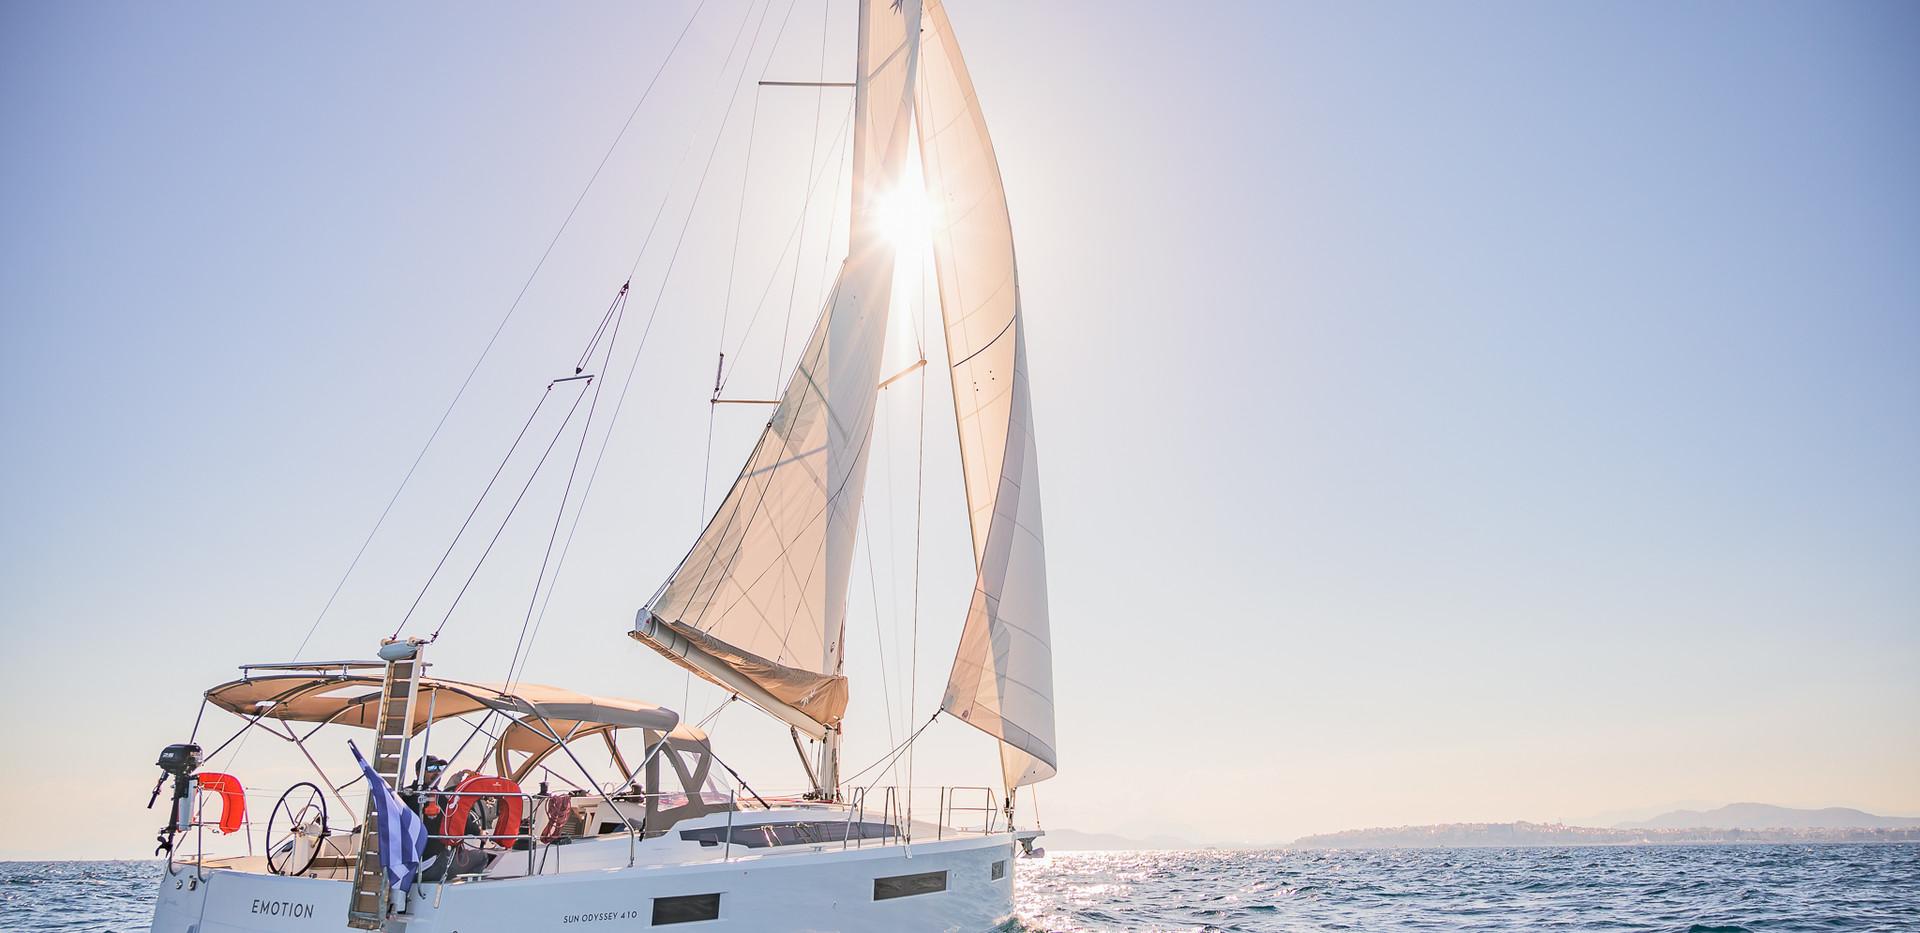 Sun-Odyssey-410-Emotion-Sail-boat-in-Ath